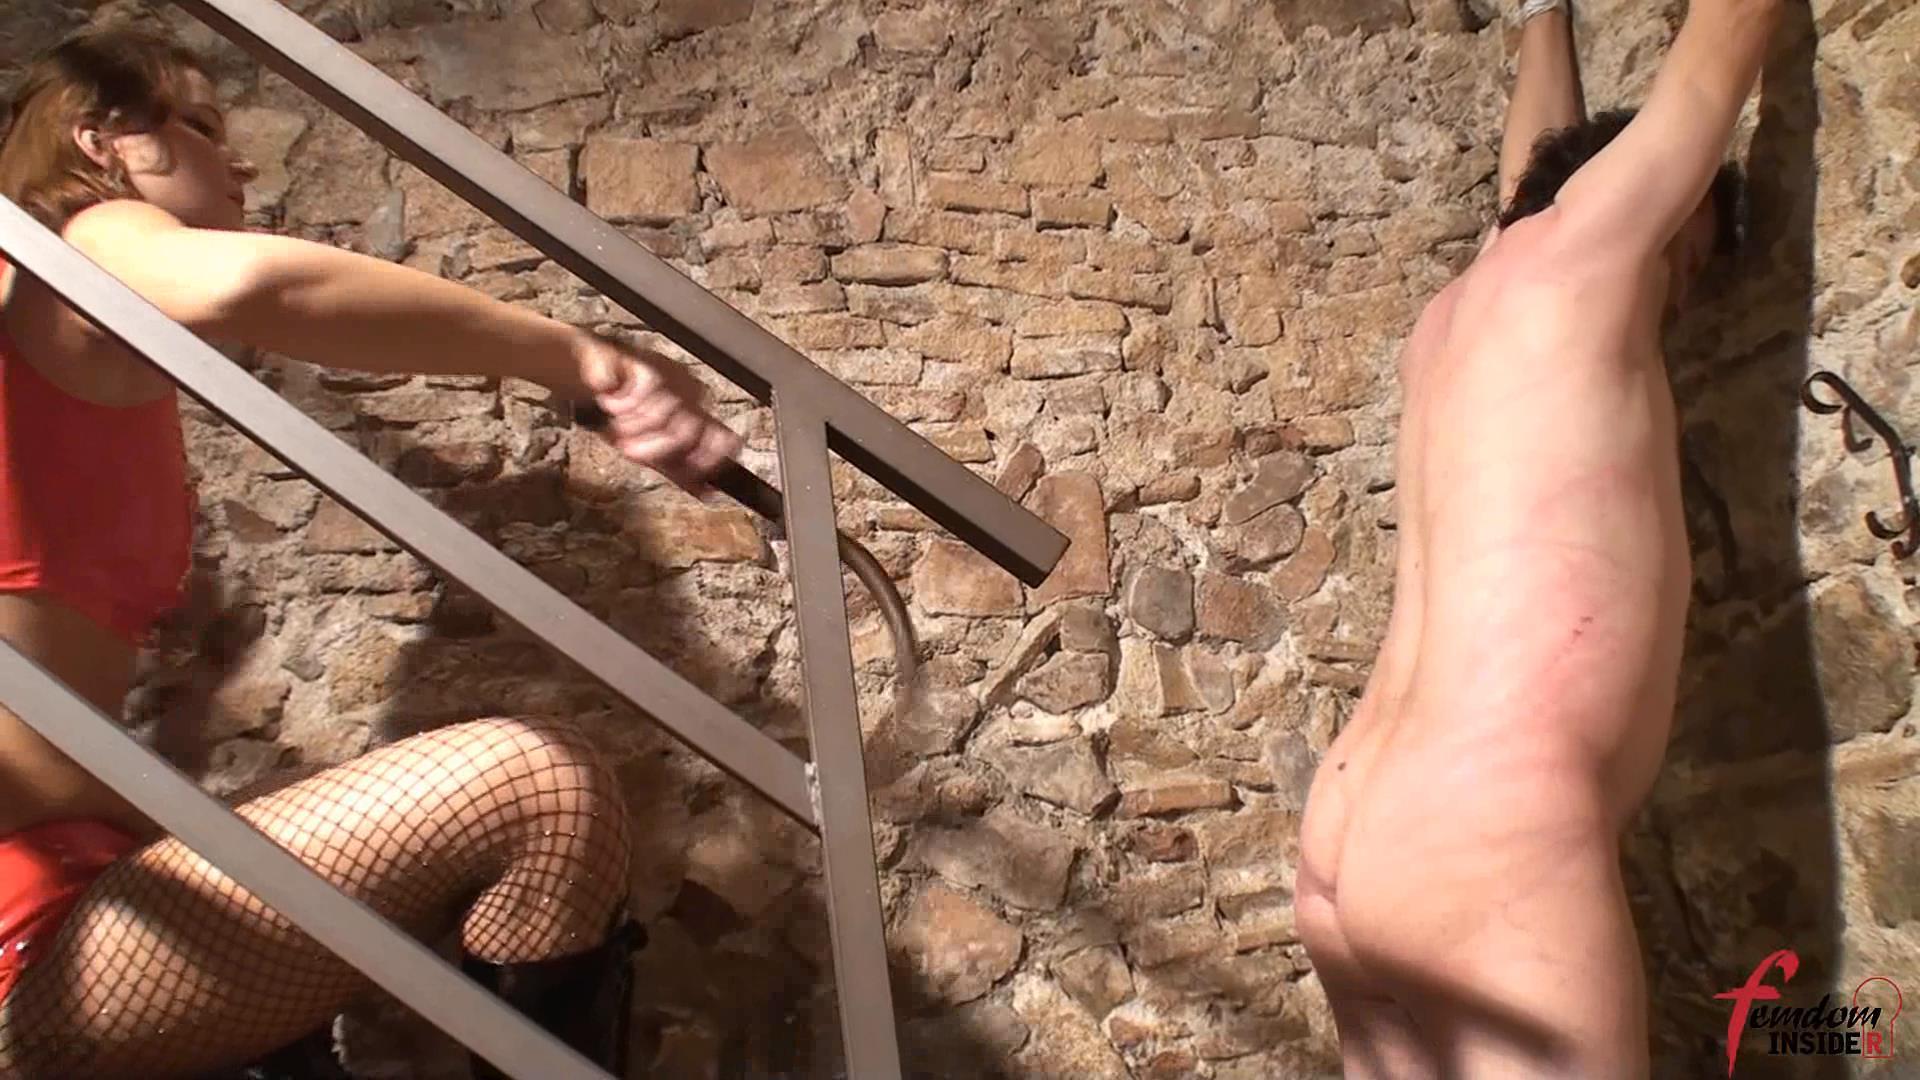 Mistress Nataly In Scene: Stairway To Pain - FEMDOMINSIDER - FULL HD/1080p/WMV